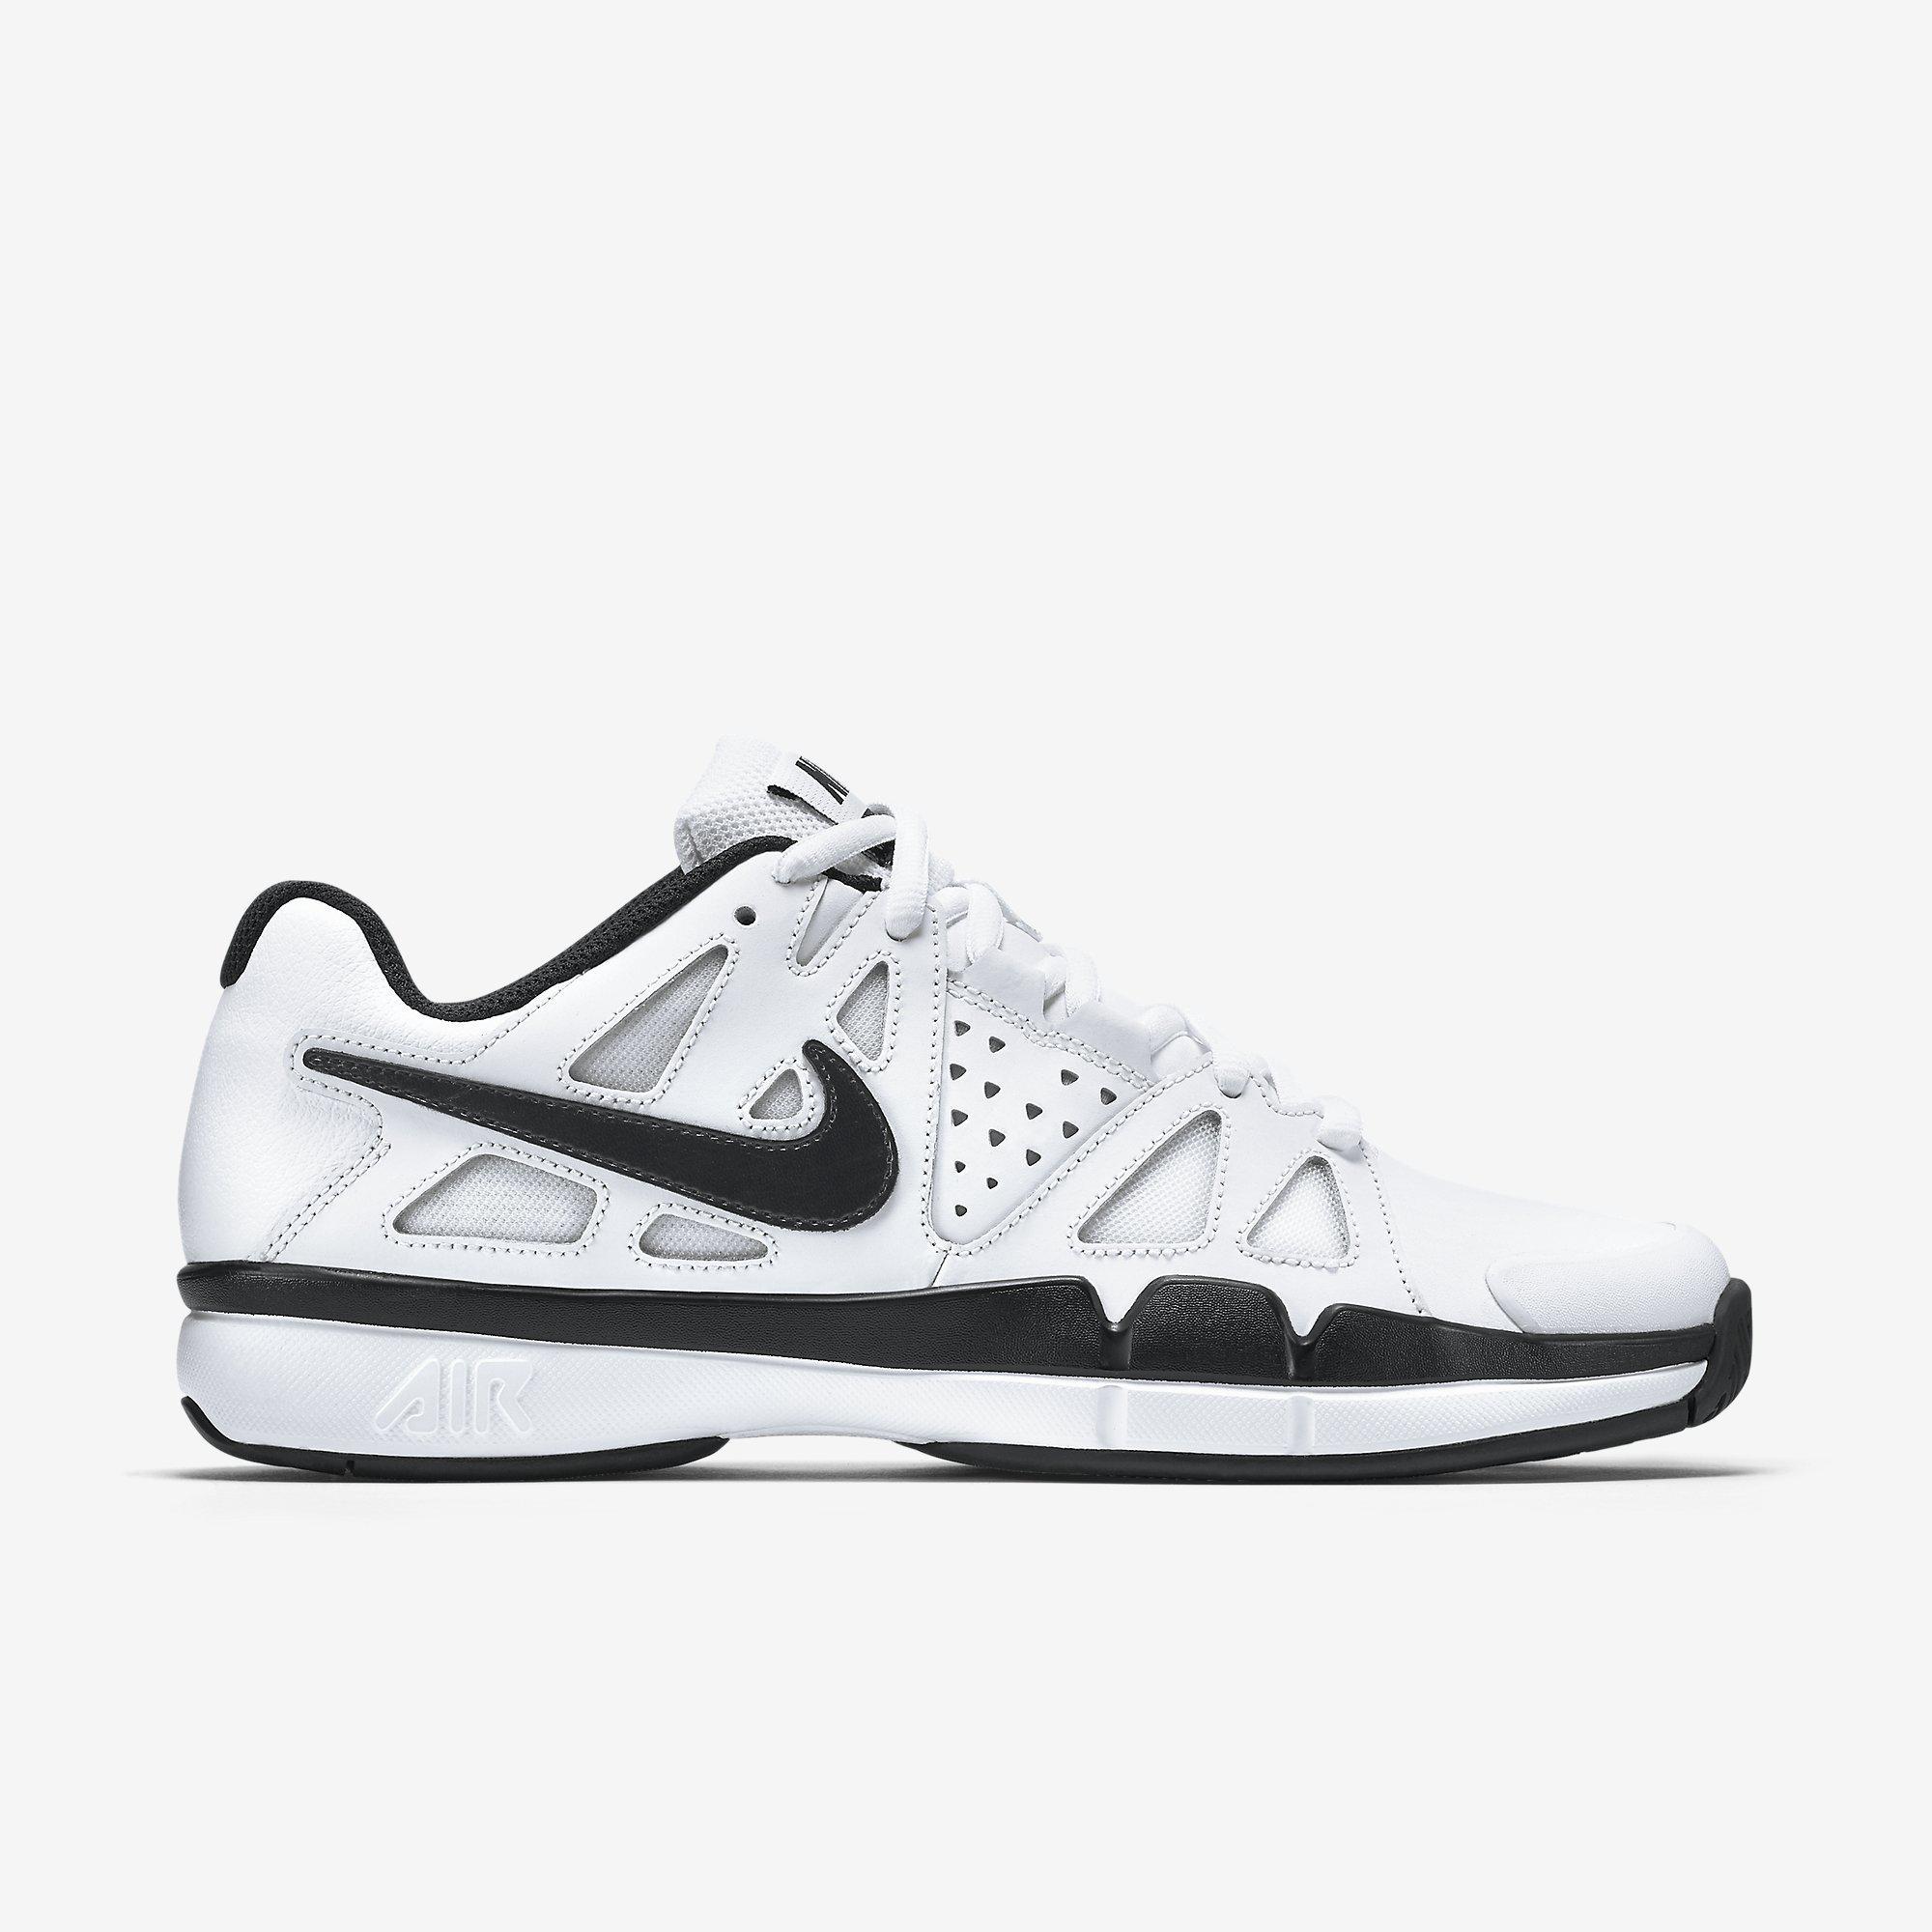 3527fc1116d8d Nike Mens Air Vapor Advantage Leather Tennis Shoes - White/Black -  Tennisnuts.com